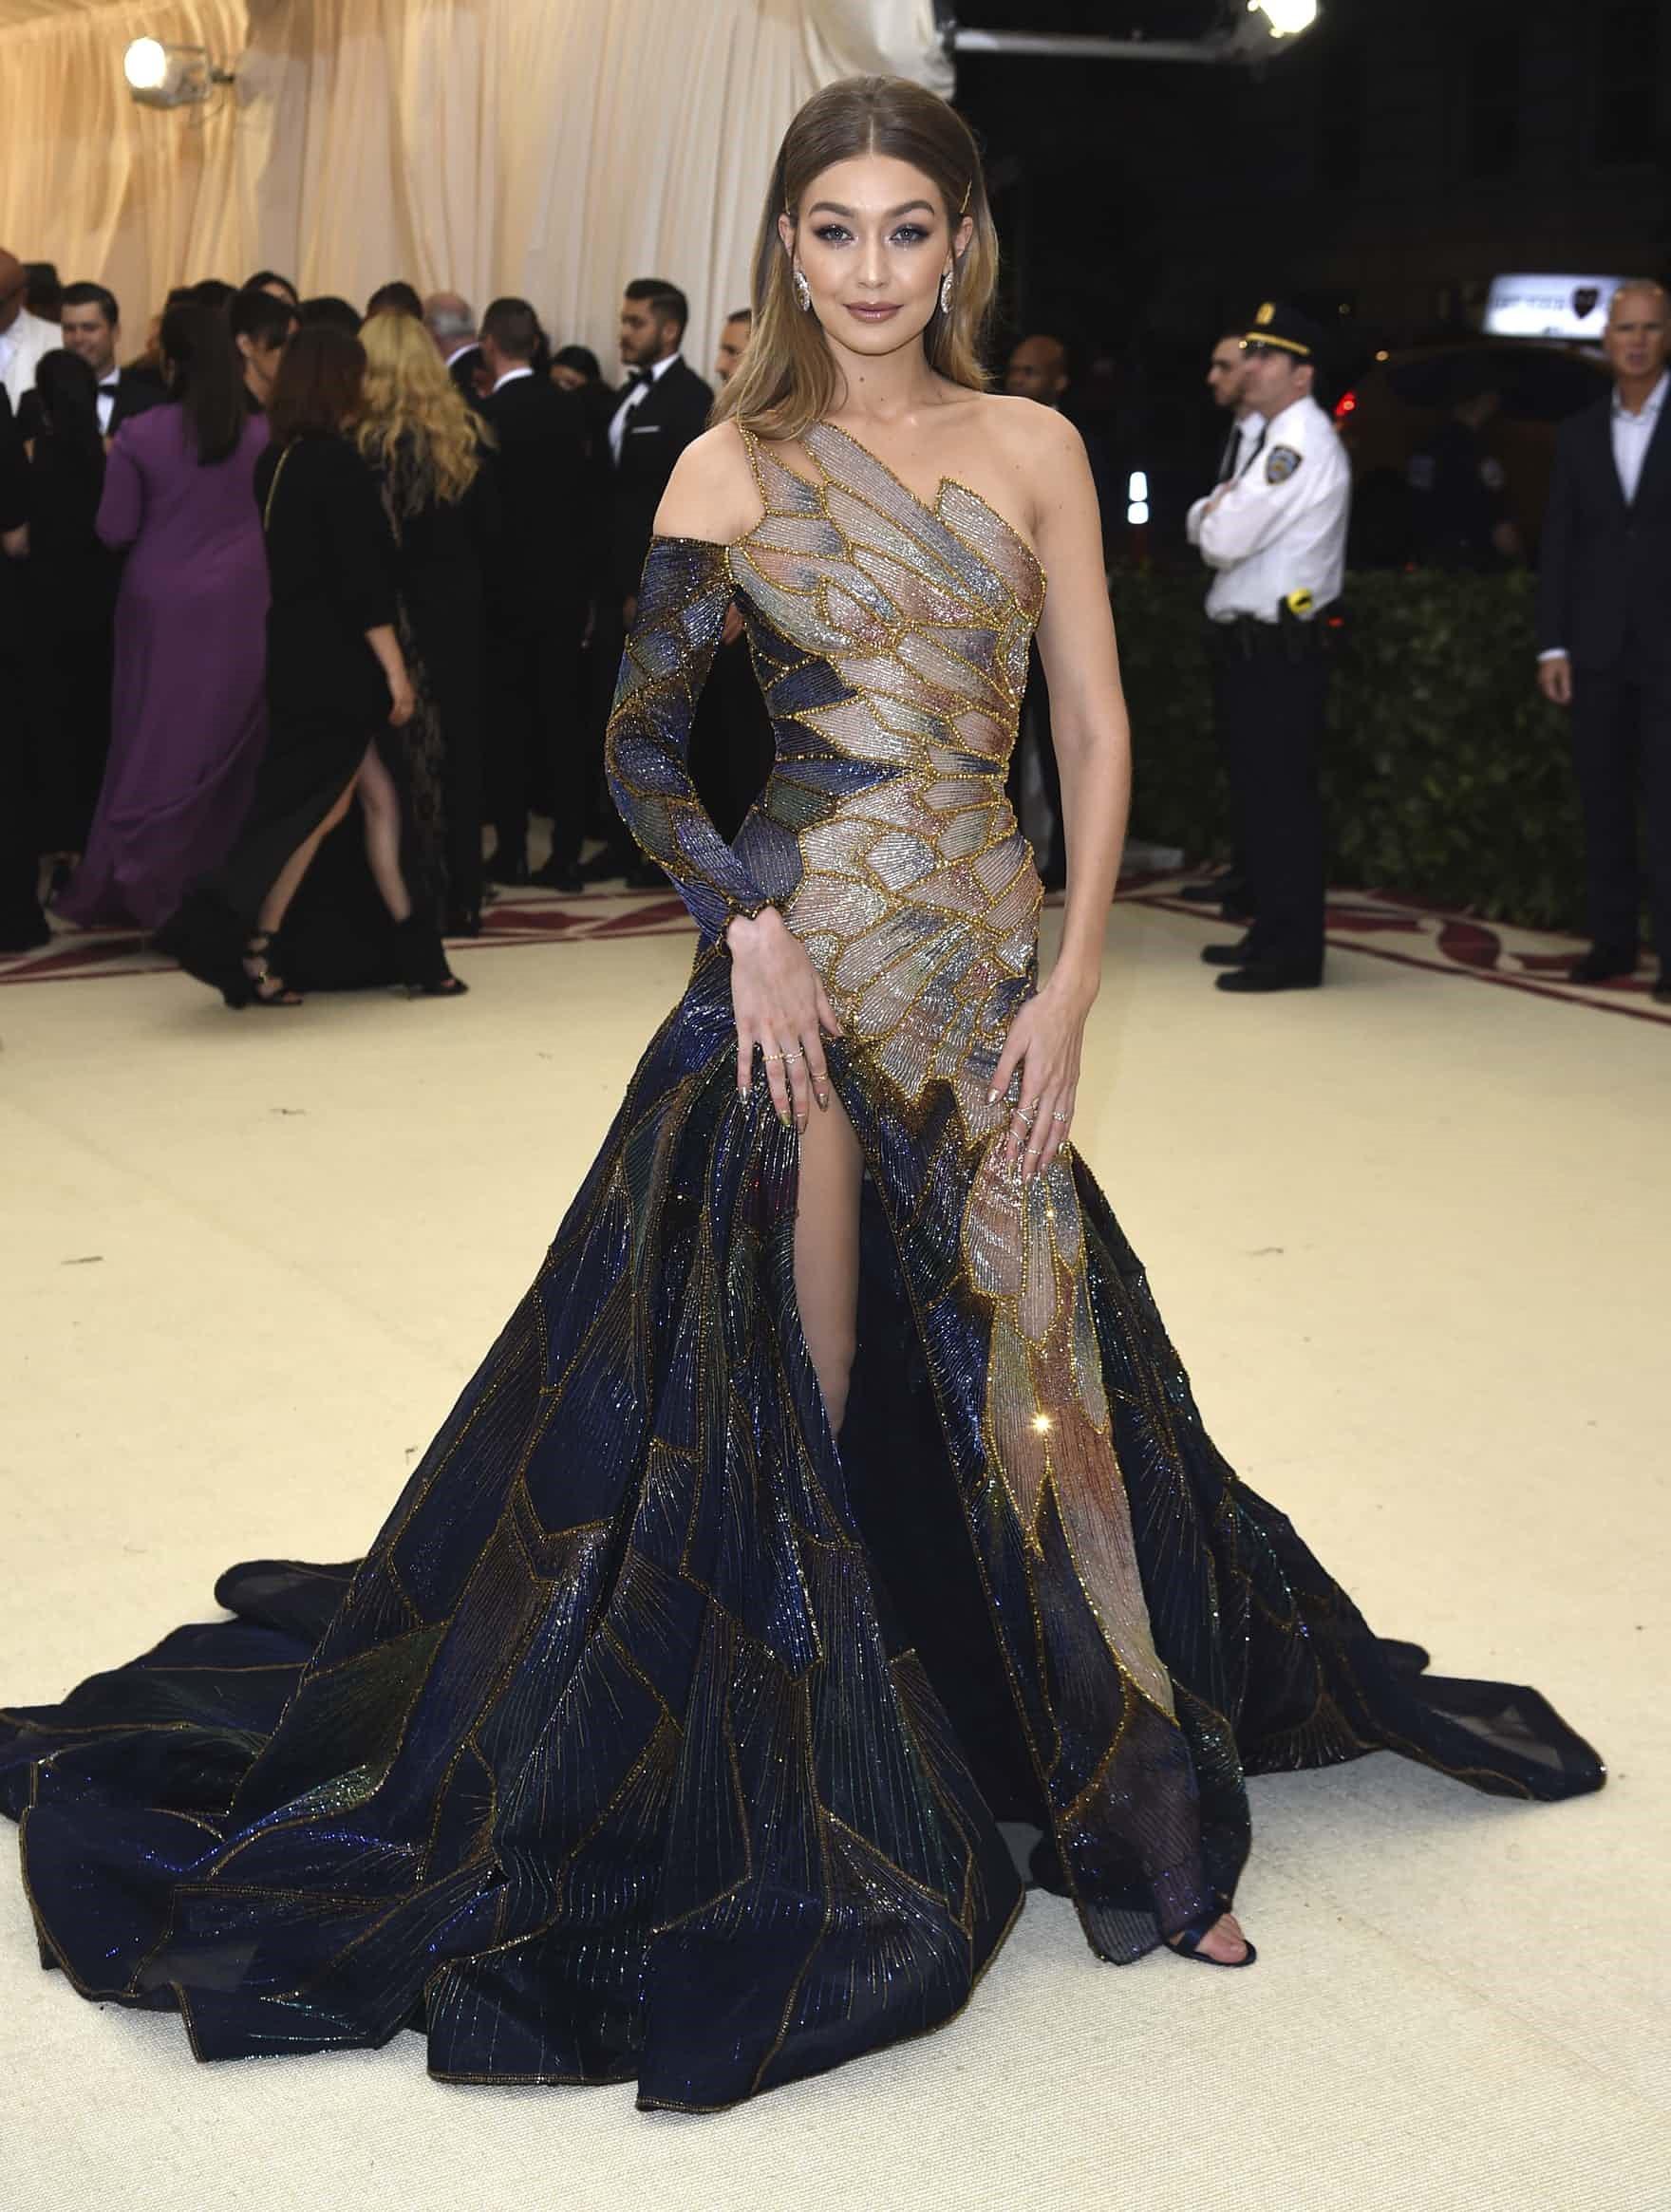 In the name of Fashion in the name of fashion In the name of Fashion – Heavenly Bodies and Catholic Imagination Made Versace